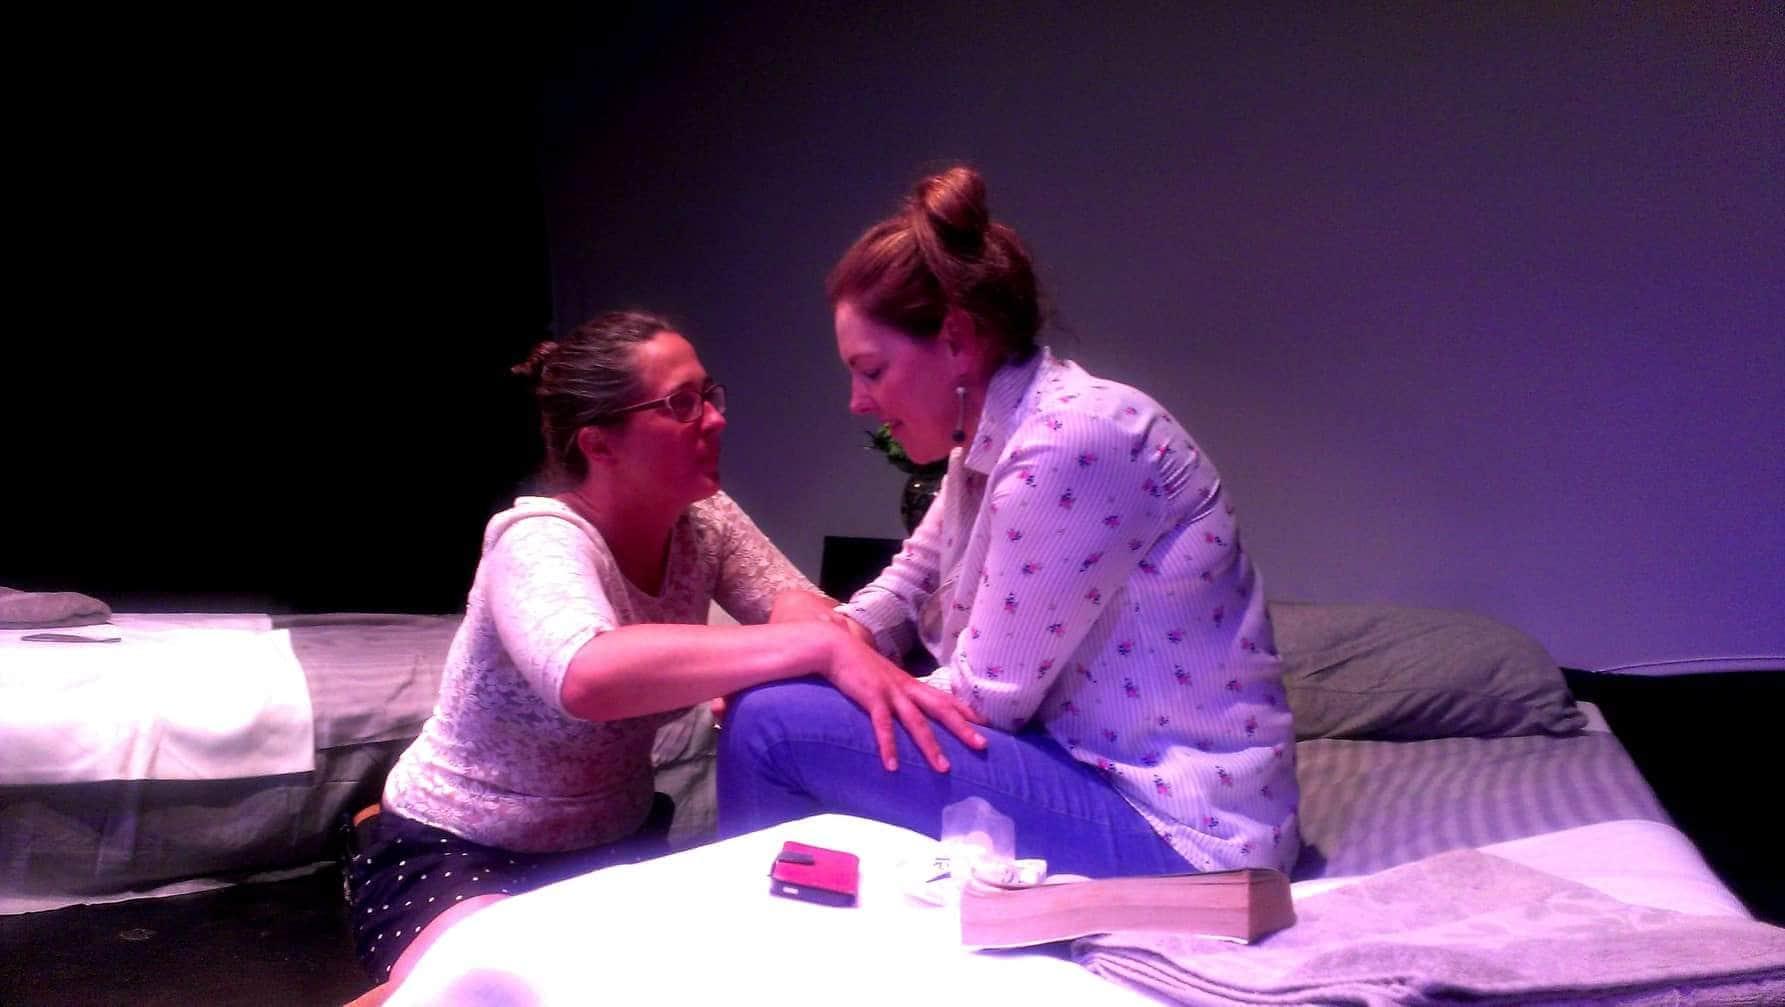 Eavan Brennan and Siobhan Donnellan. Photo Courtesy of SoHo Playhouse.